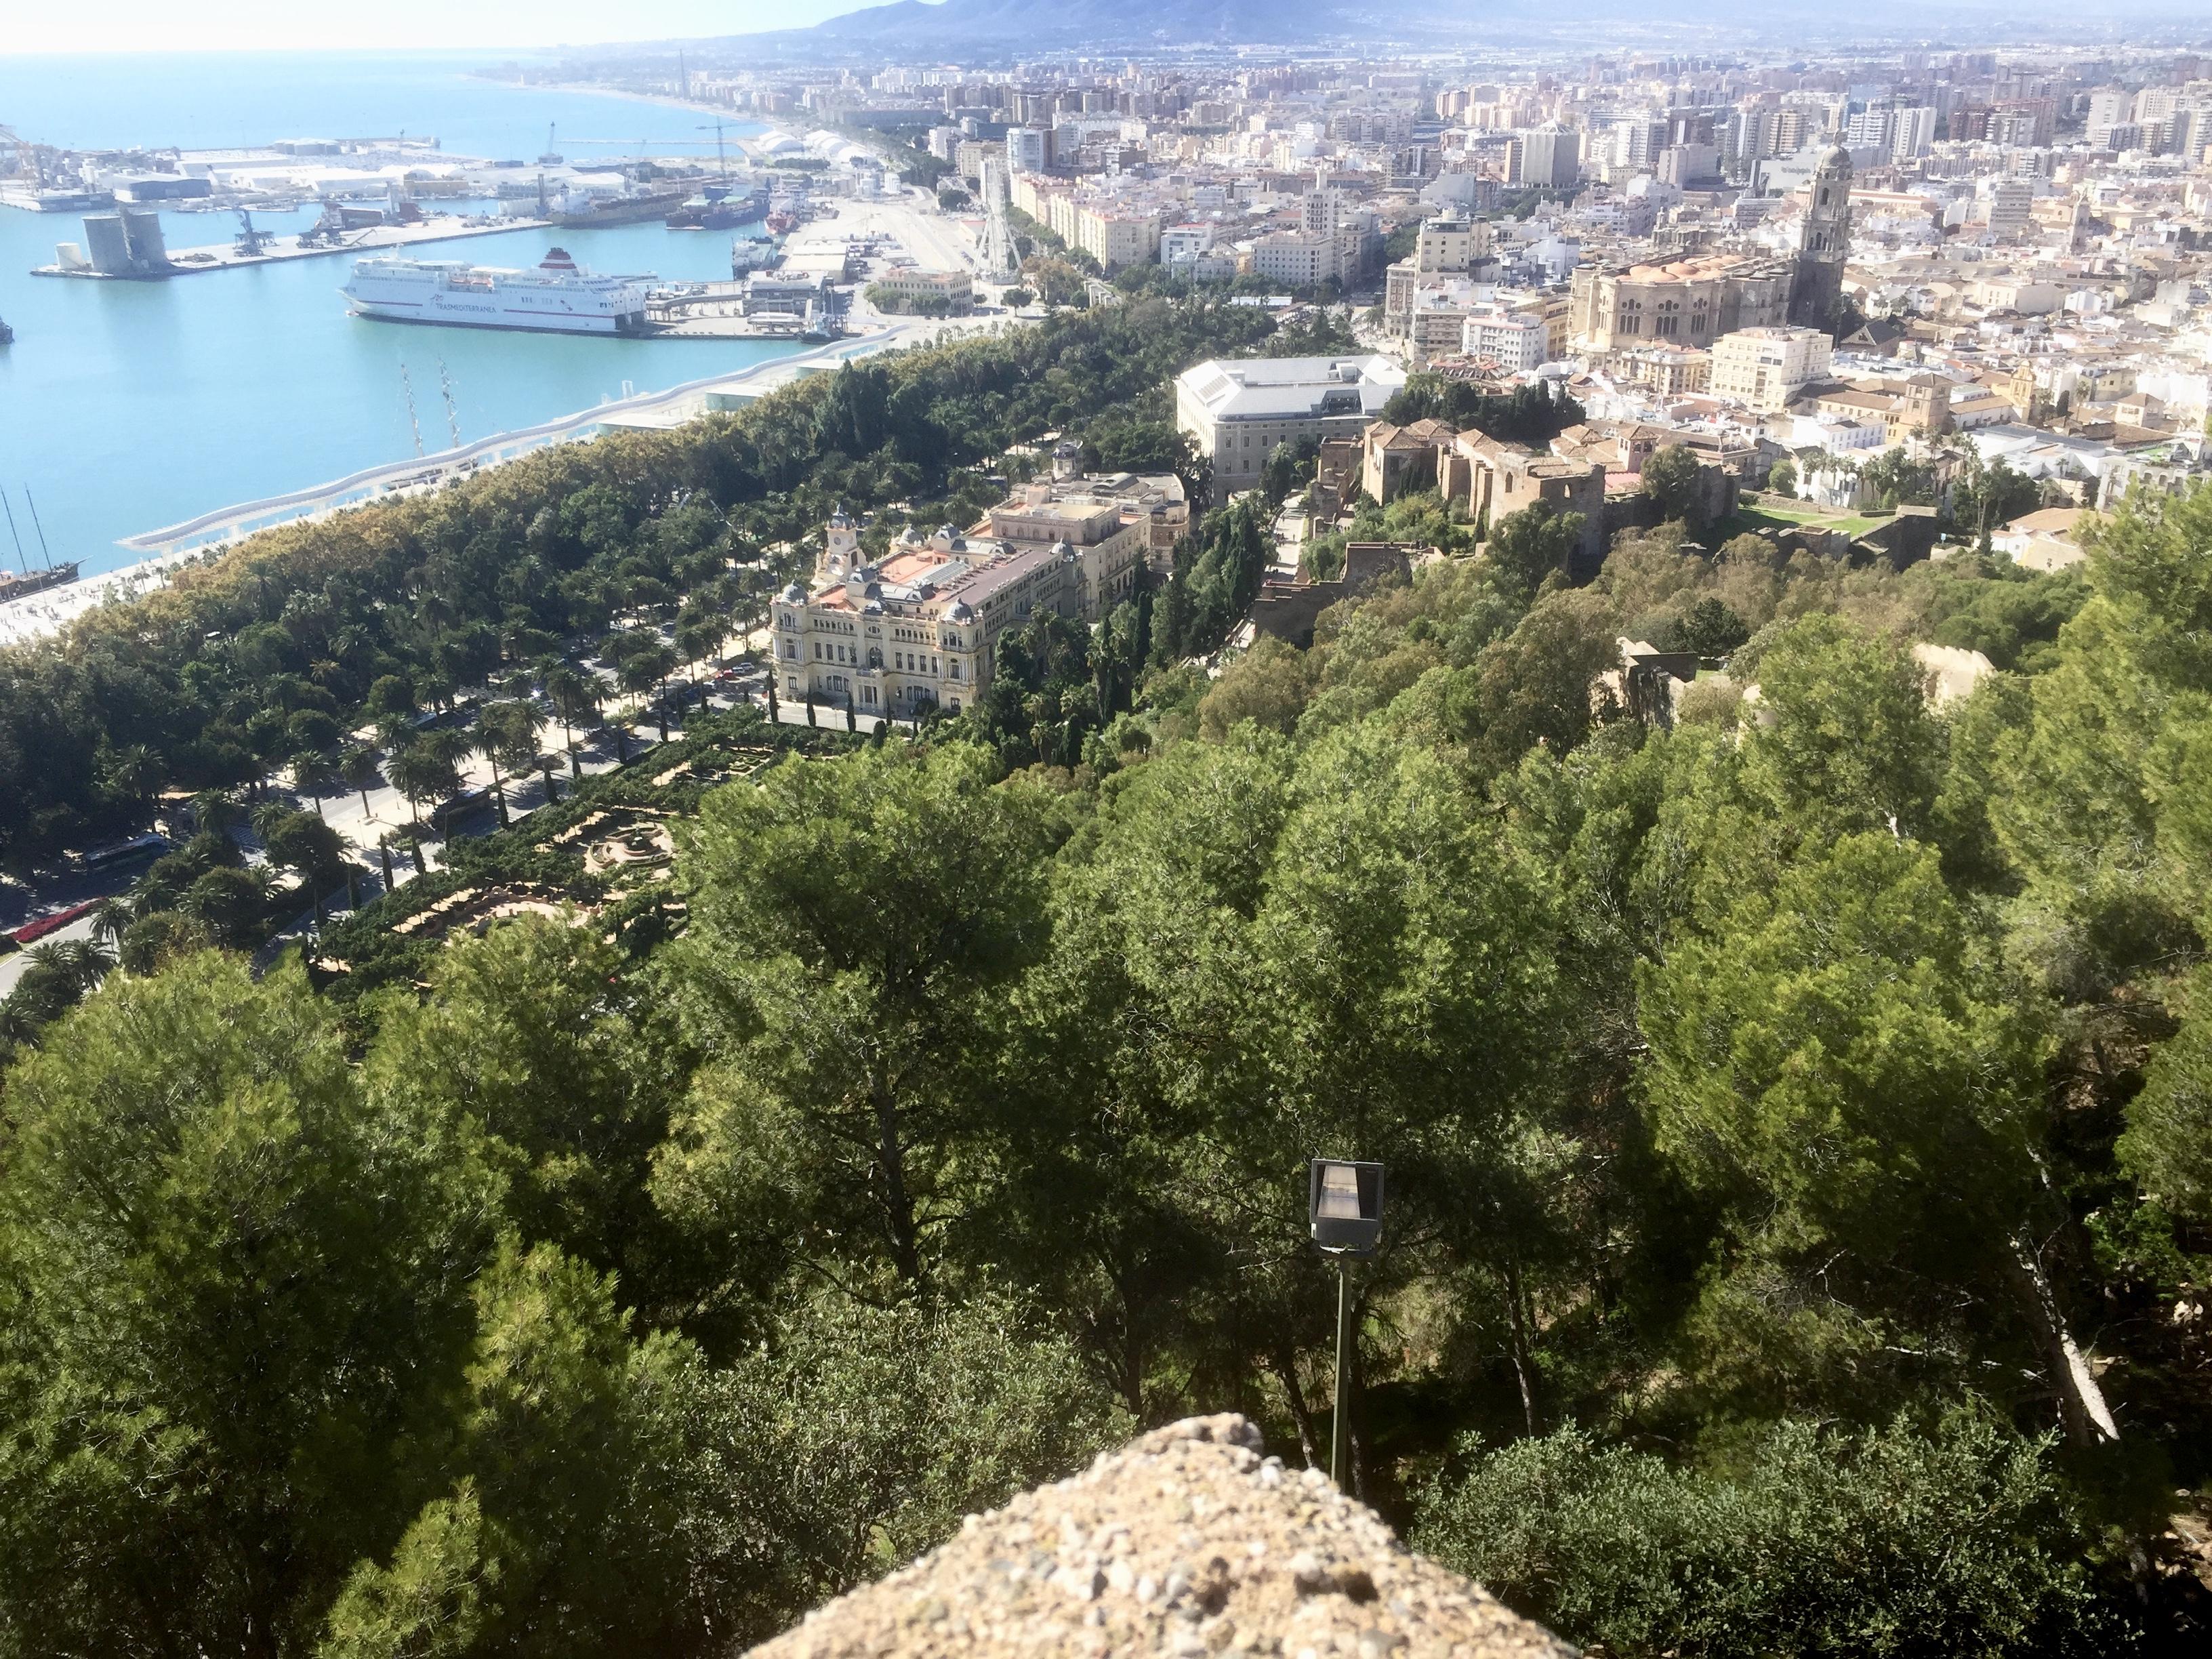 Vue sur Malaga depuis le Château du Gibralfaro